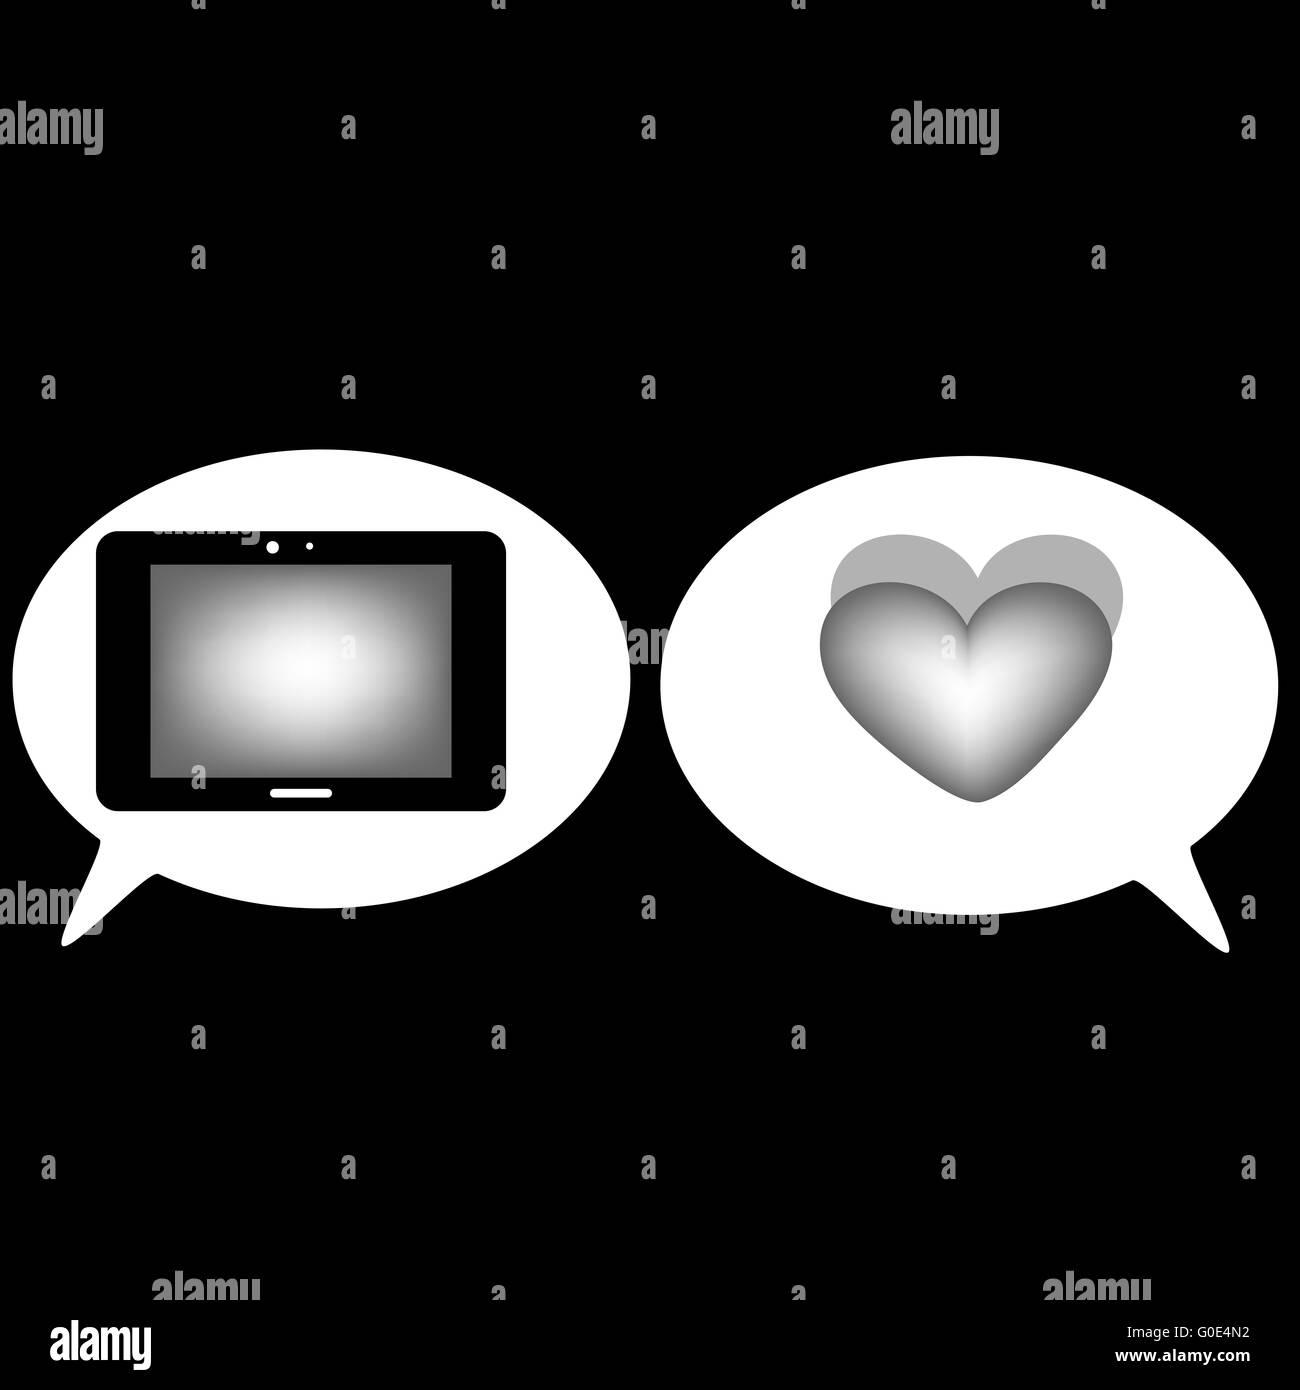 Communication tablet heart icons signs symbols stock photo communication tablet heart icons signs symbols biocorpaavc Gallery